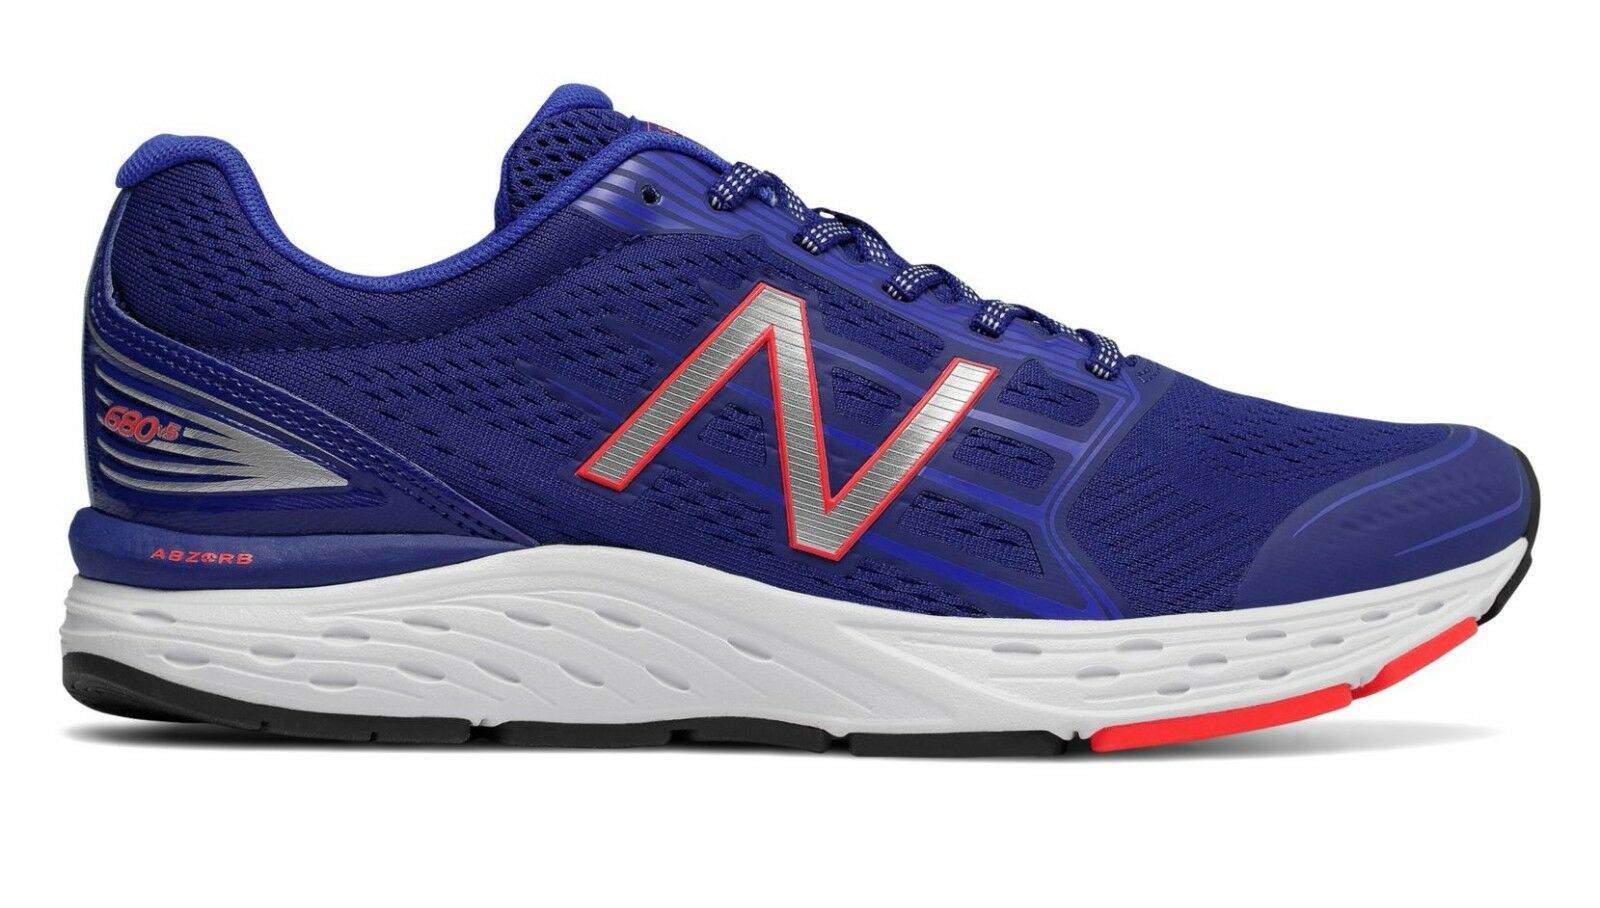 New pista Balance hombres 680v5 corriendo, pista New nosotros 7 4E m680lp5 6964b3